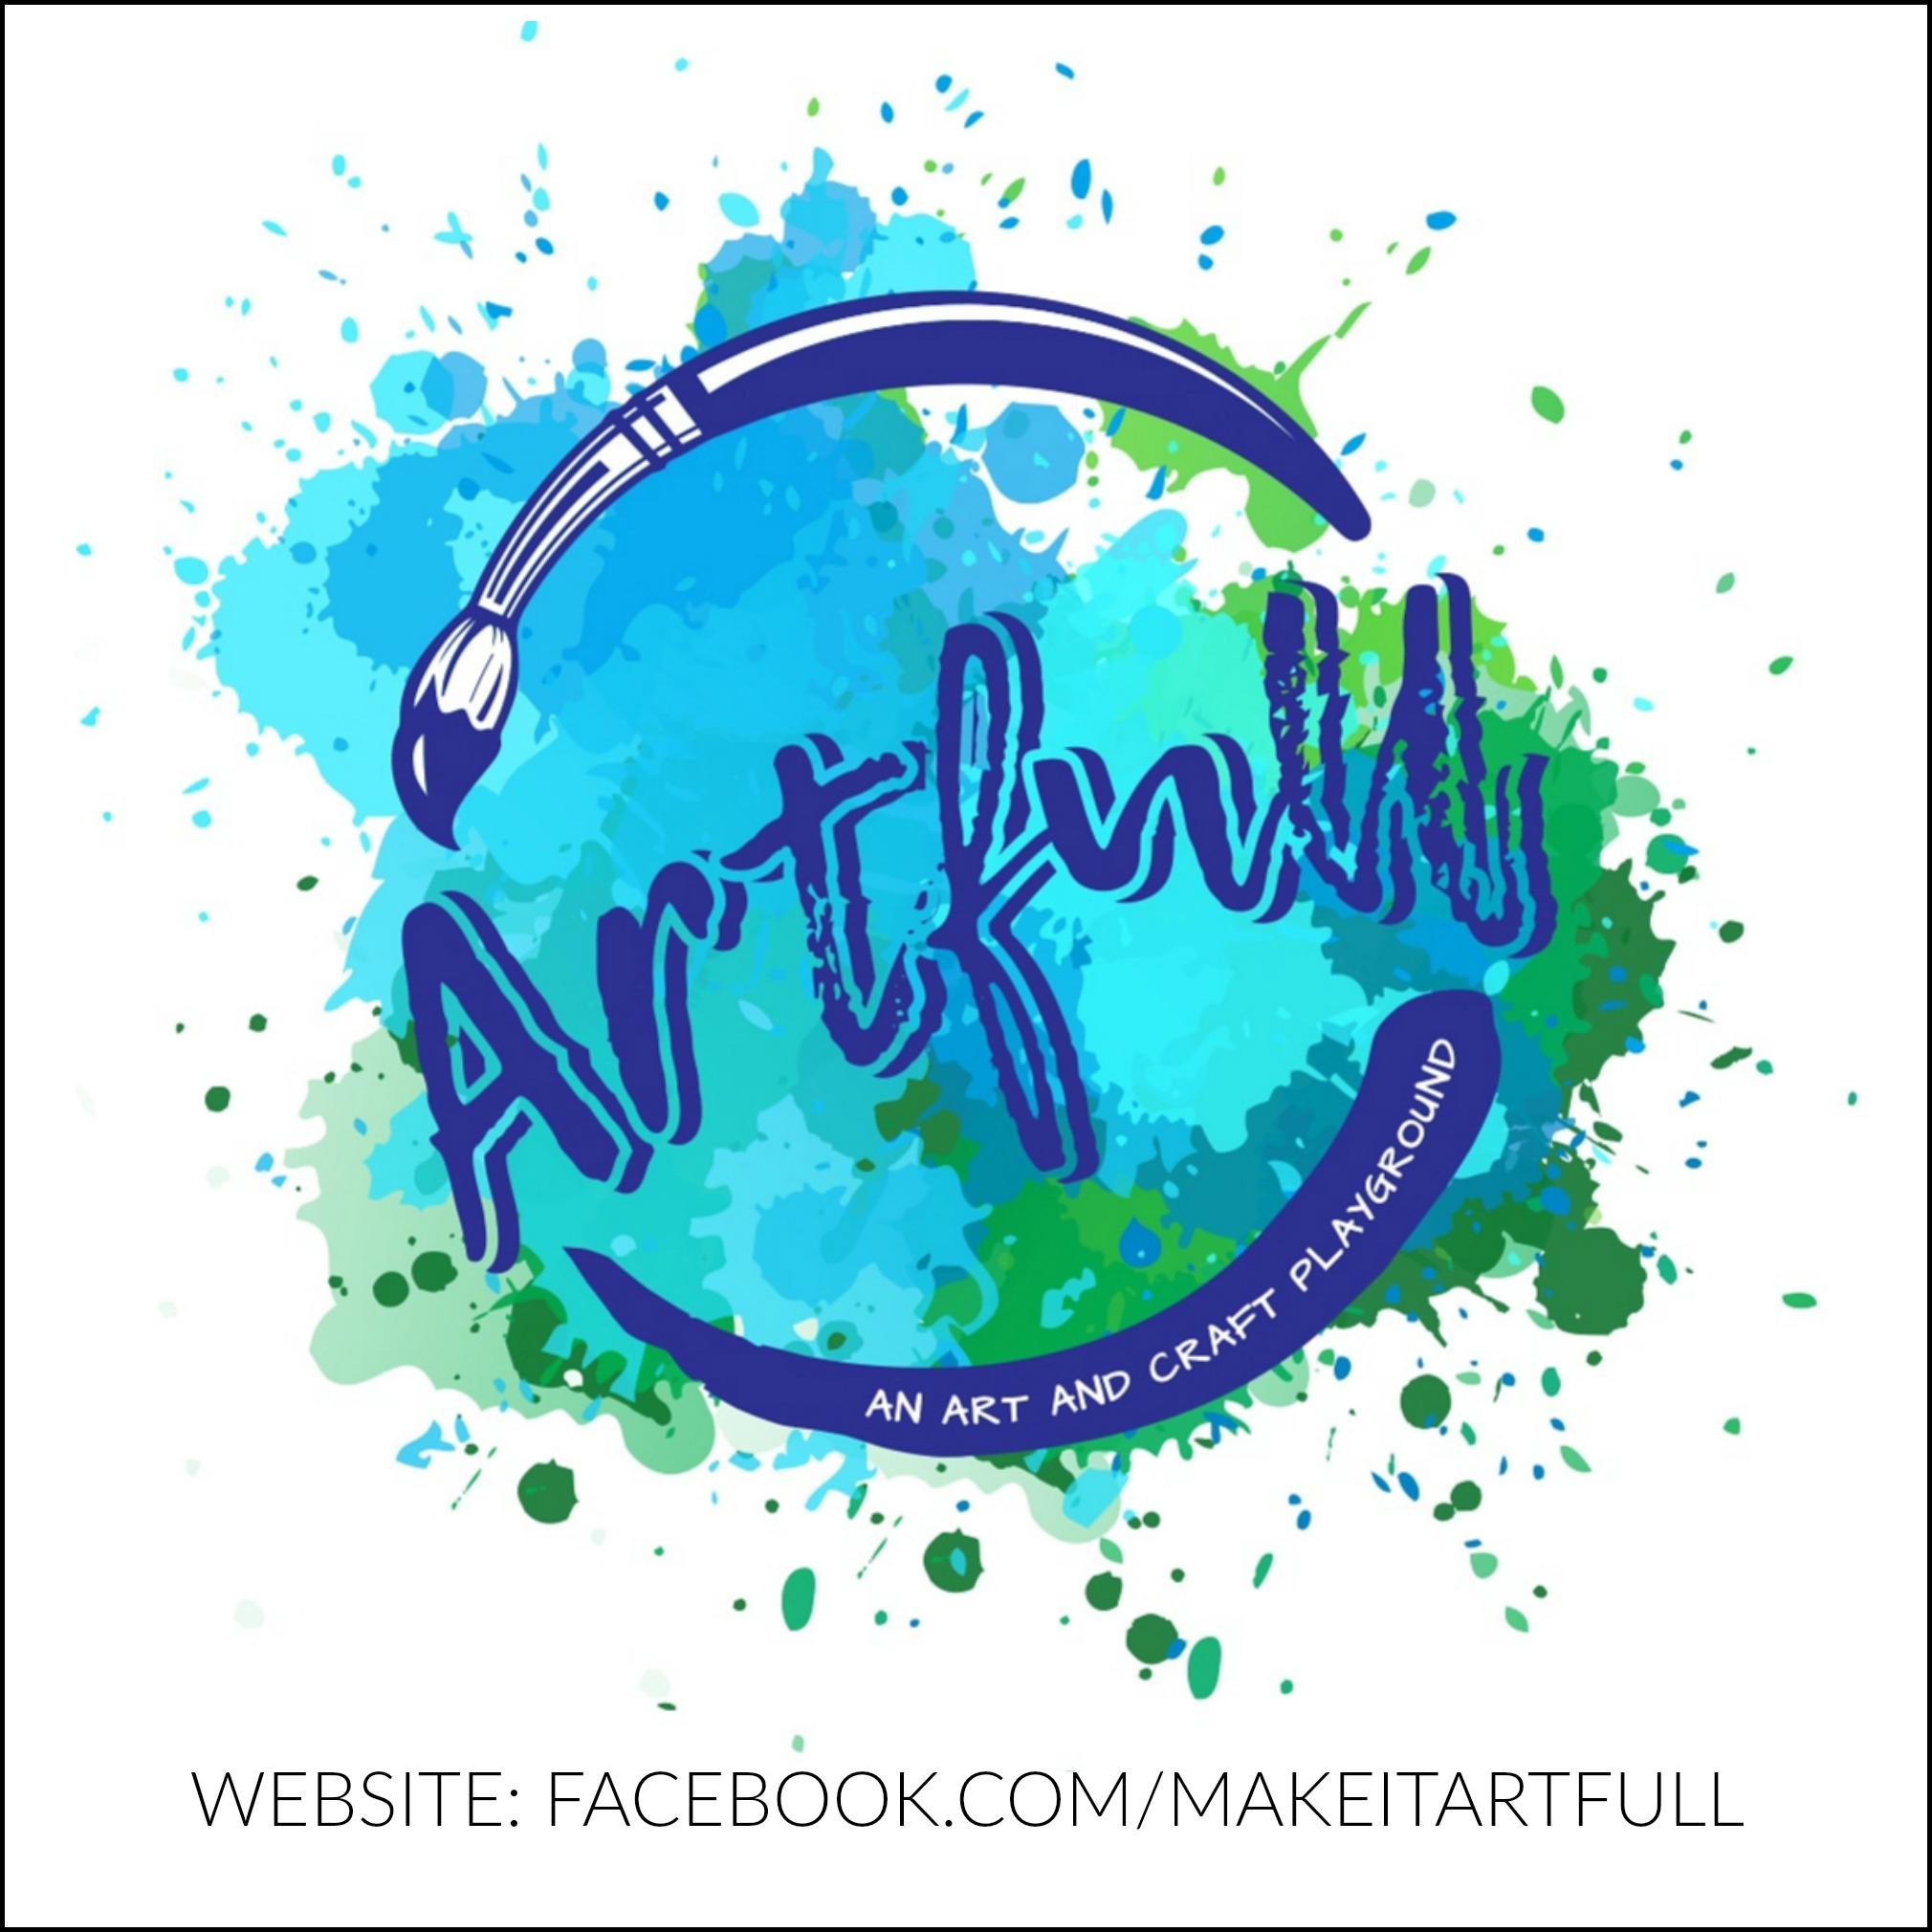 Artfull : An art and carft Playground | Facebook.com/makeitartfull